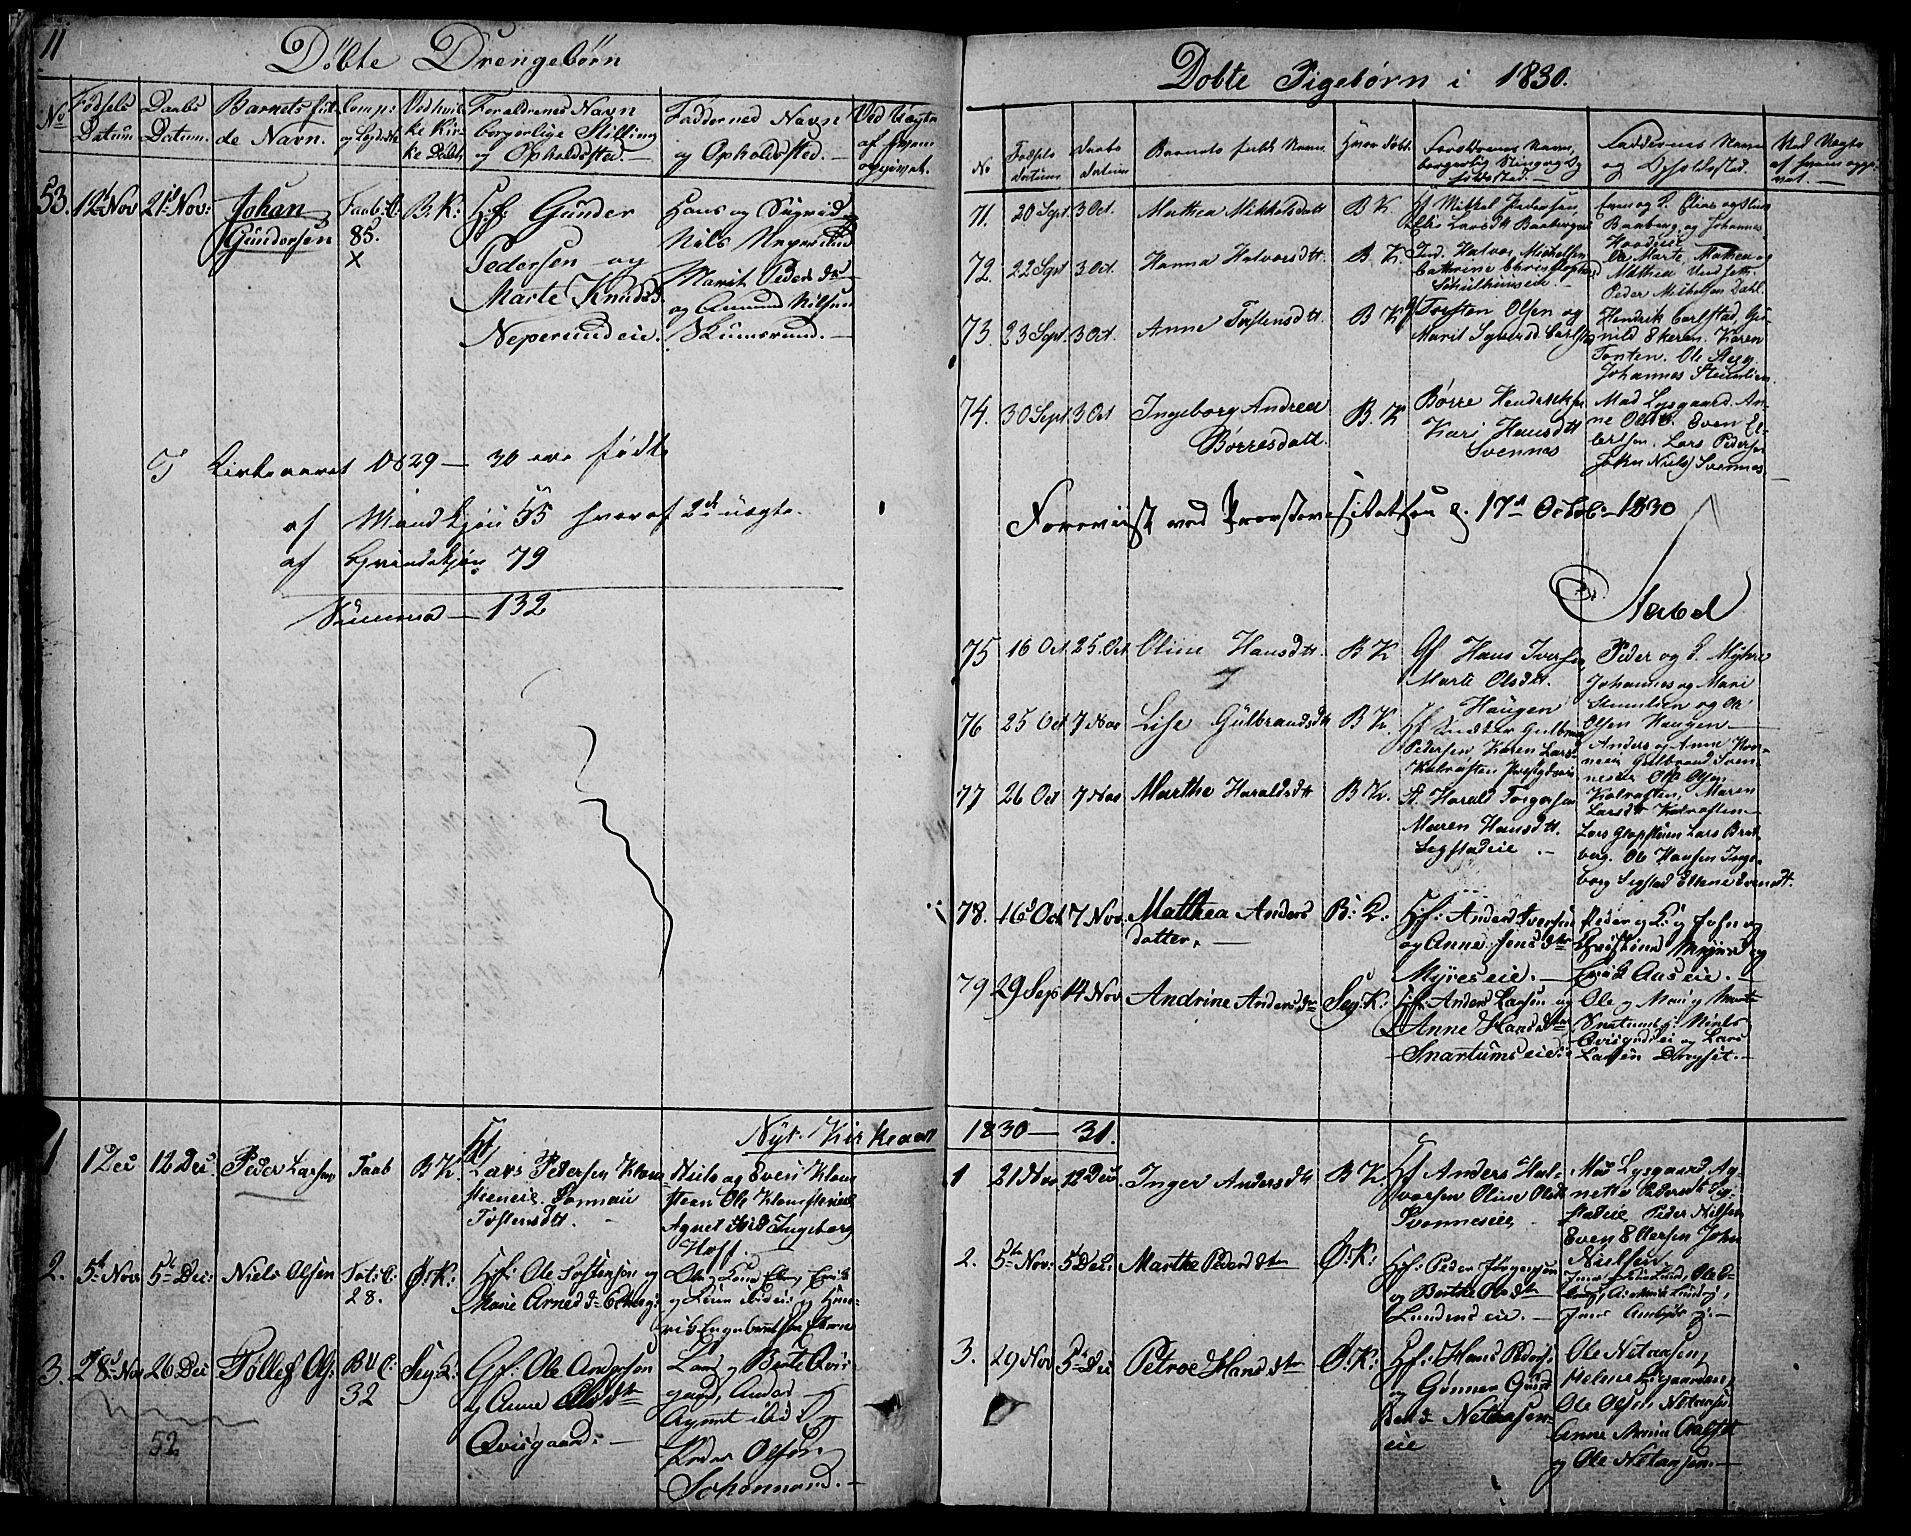 SAH, Biri prestekontor, Ministerialbok nr. 4, 1829-1842, s. 11